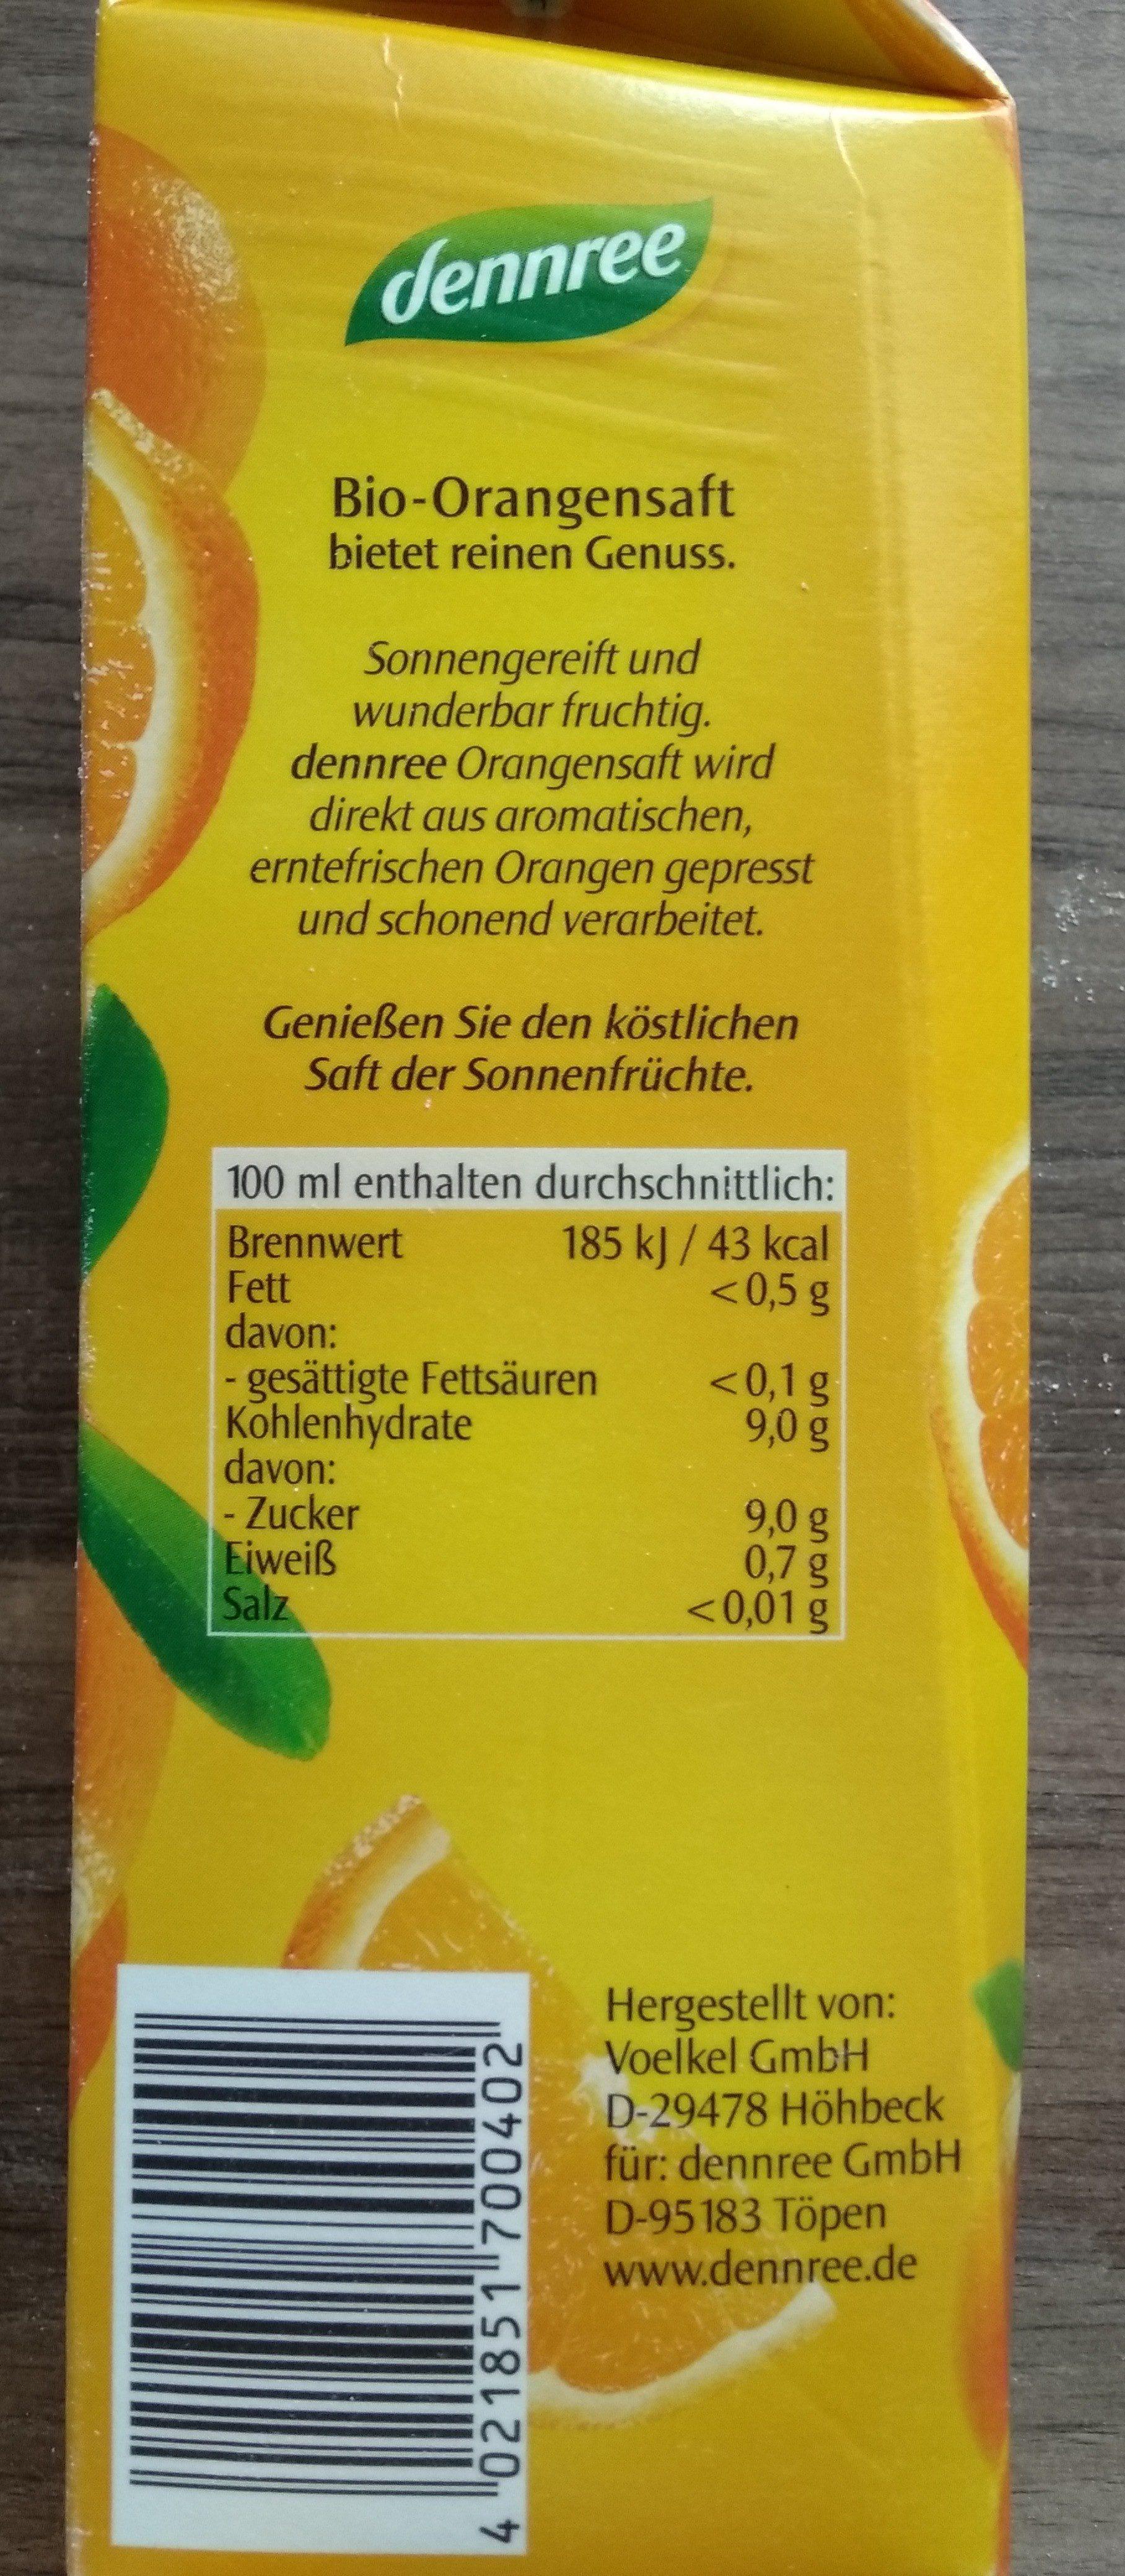 dennree Orangensaft - Nutrition facts